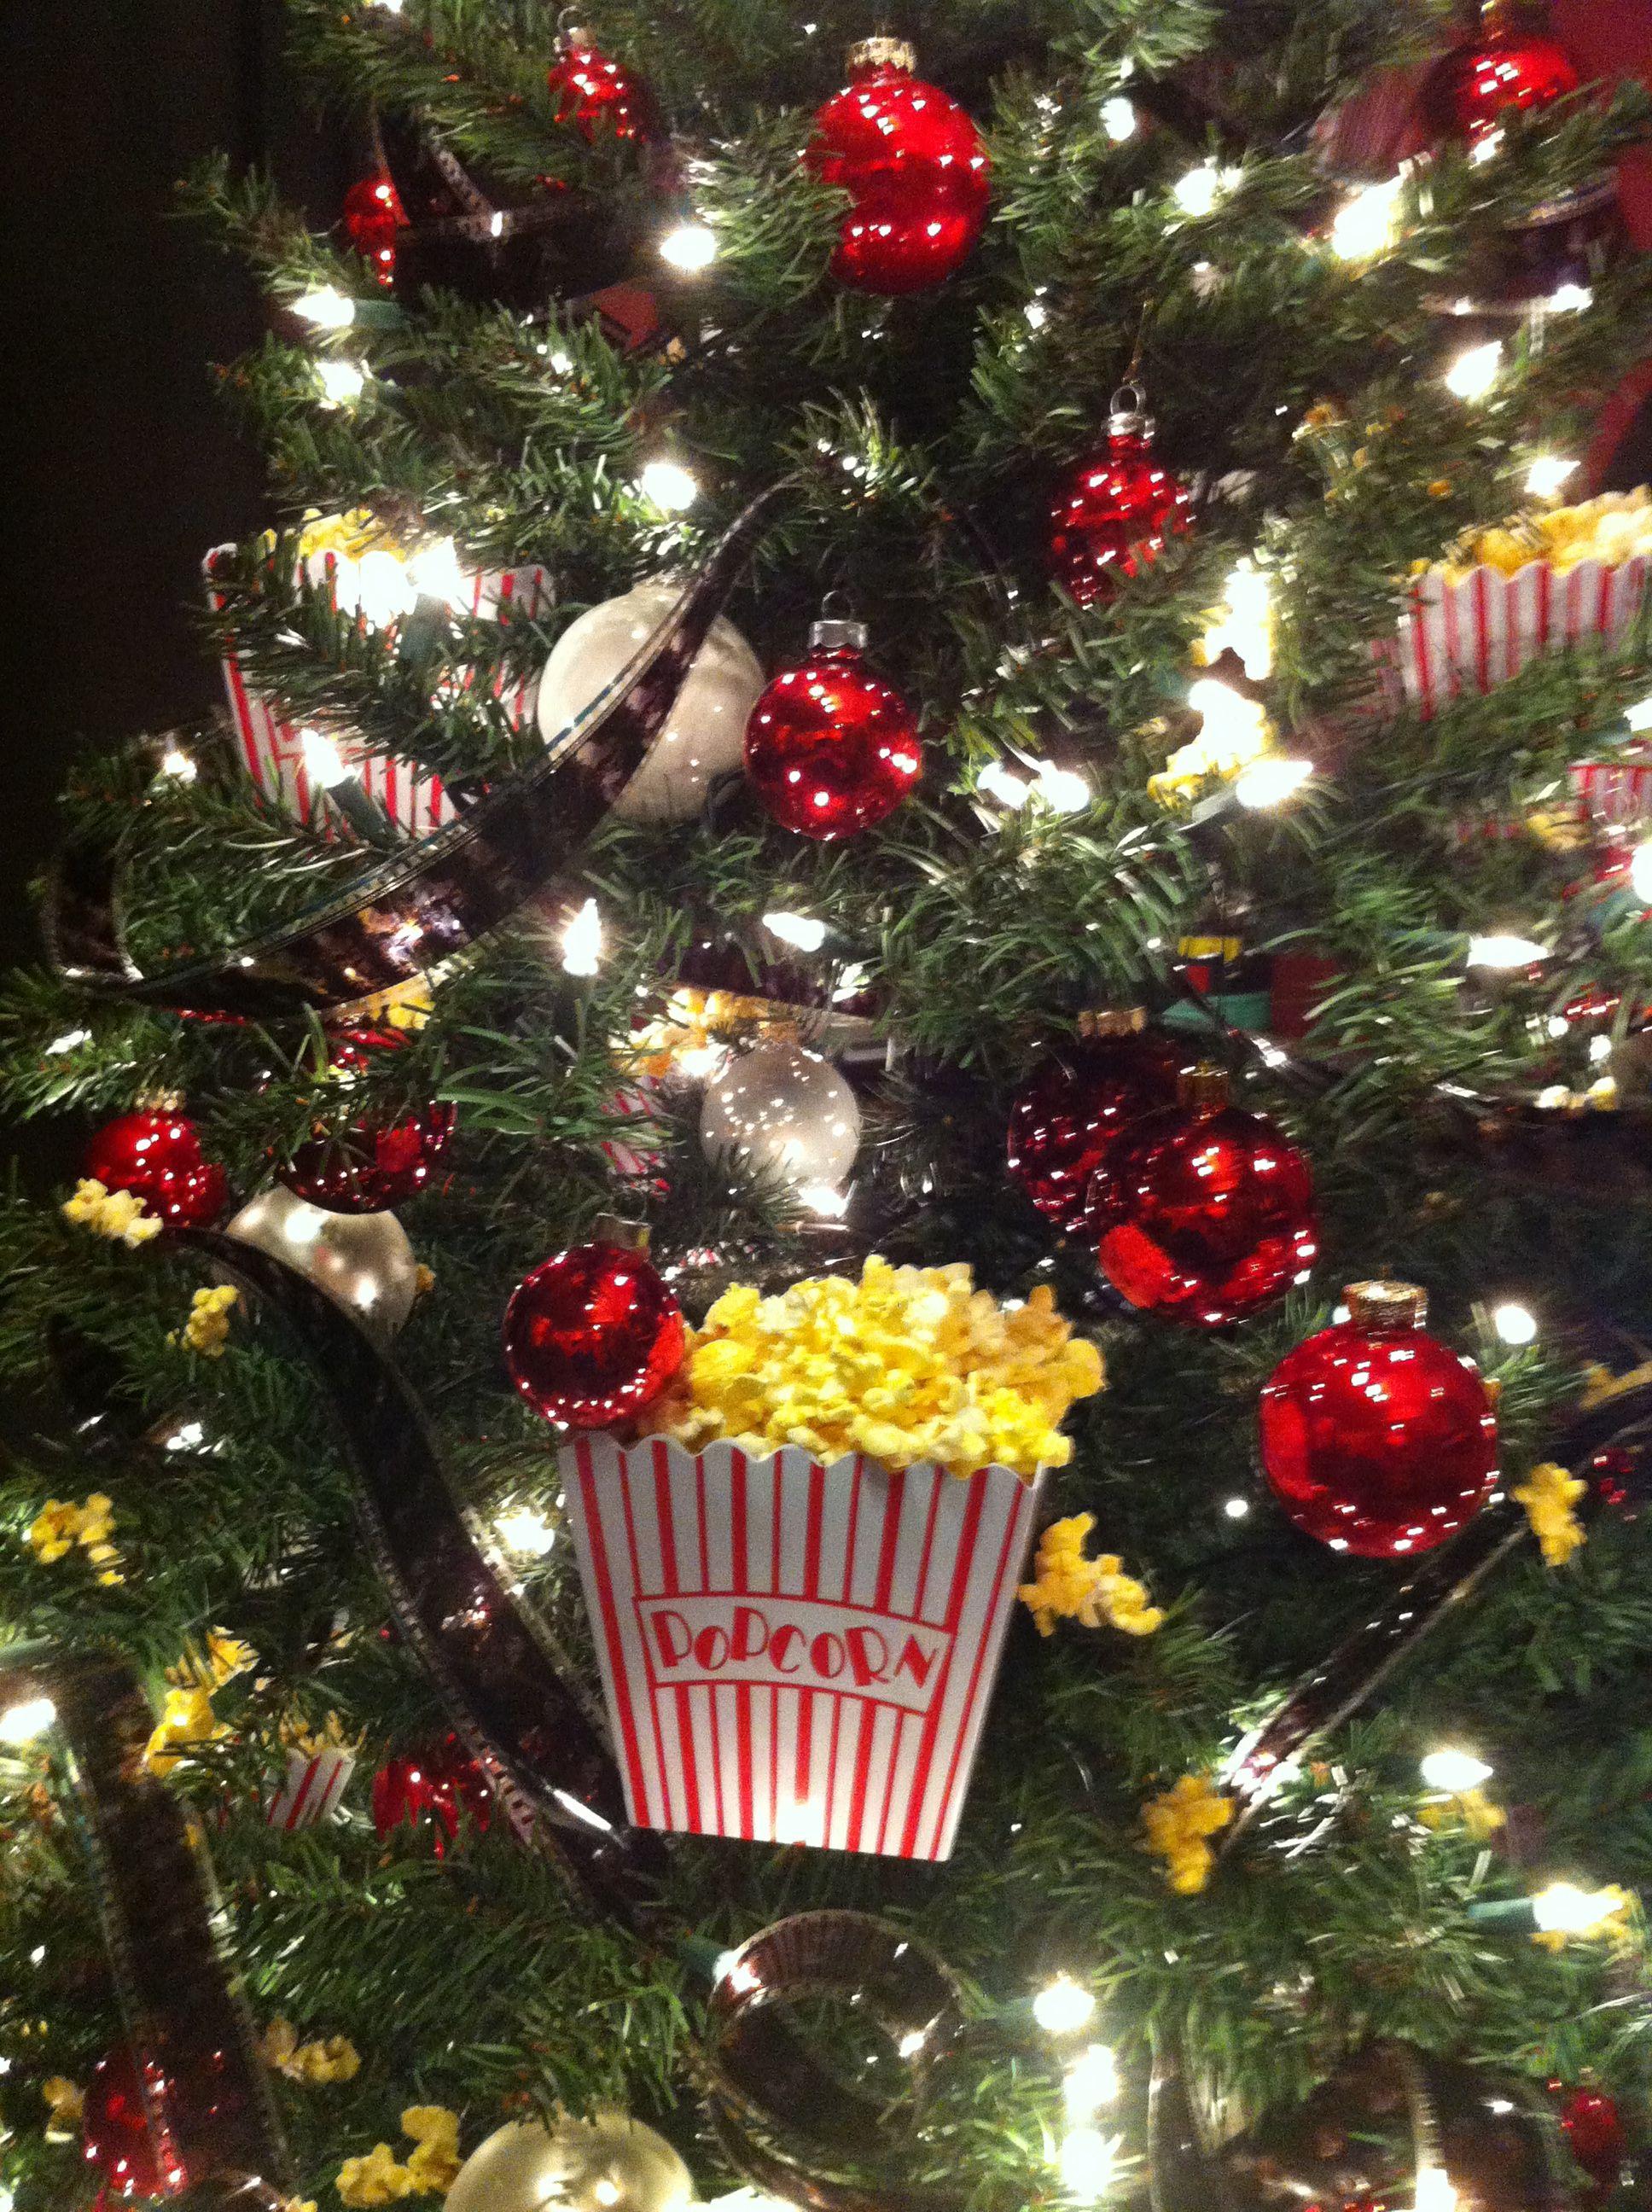 Movie themed tree holidays Pinterest Christmas tree